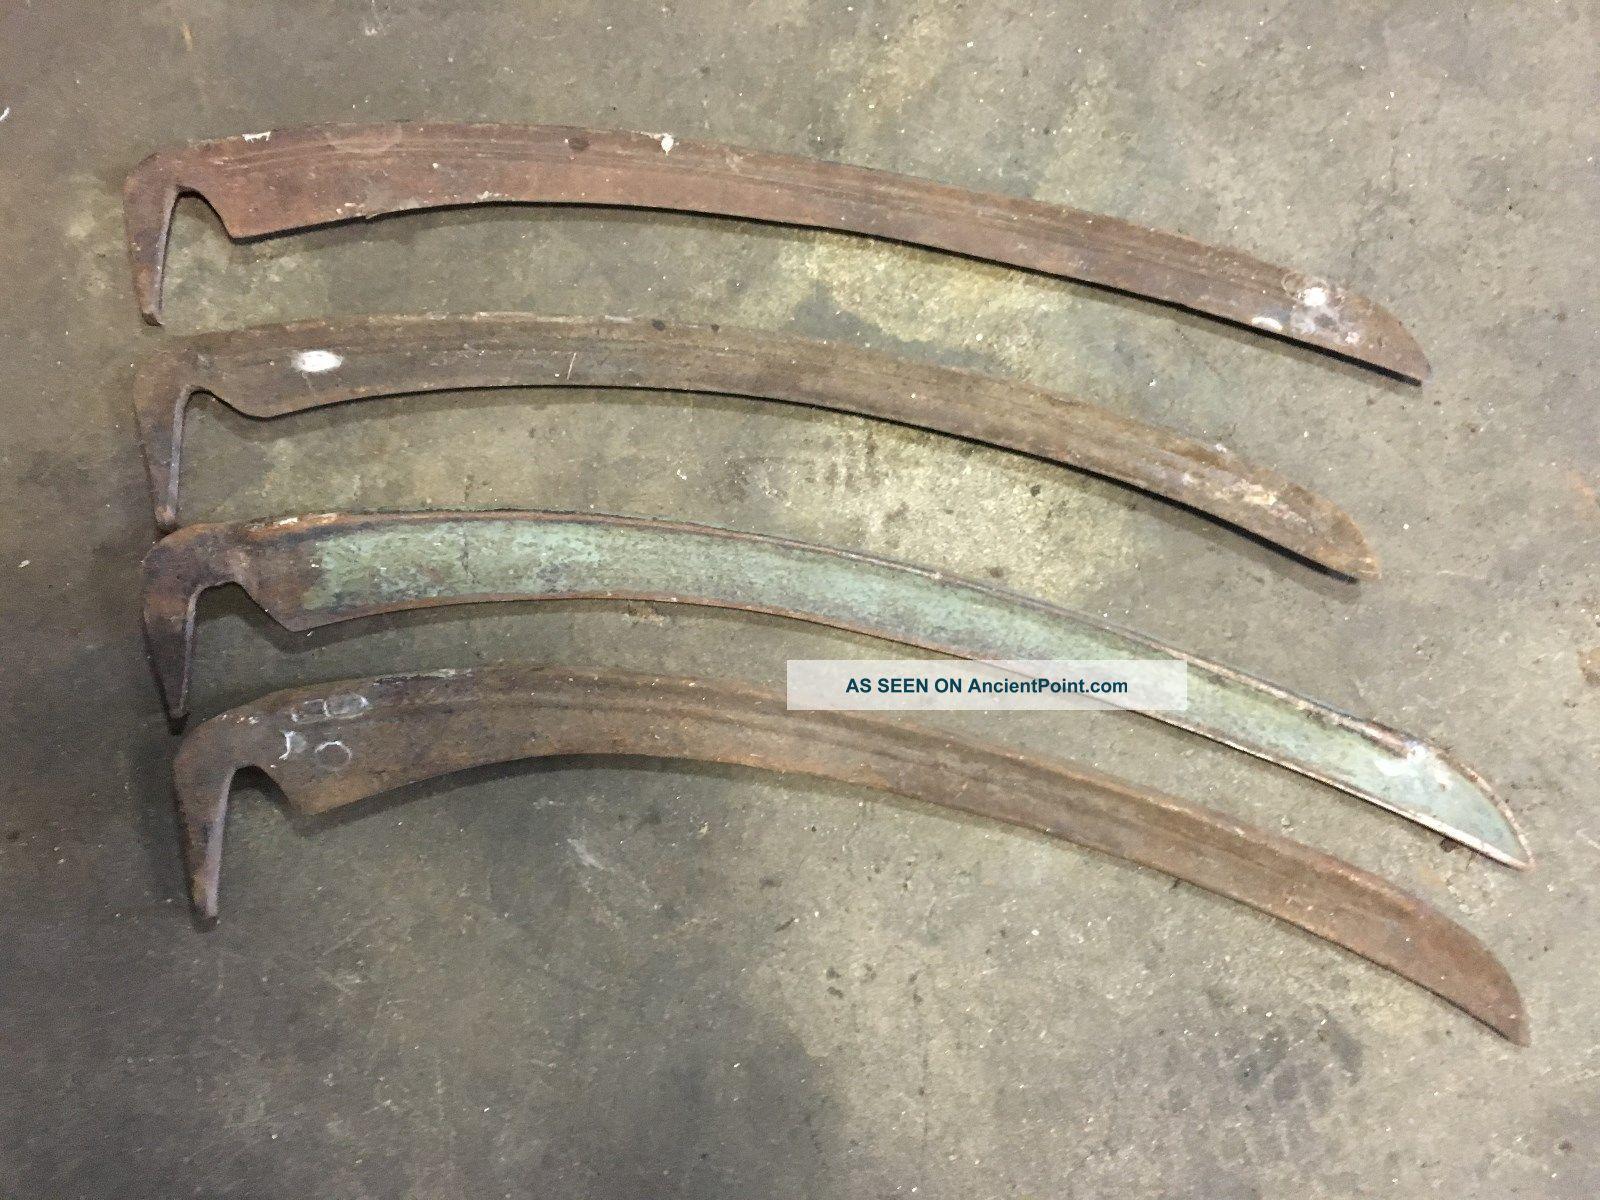 4 Lotantique Old Hand Sickle Scythe Blade Farm Tool Cutter